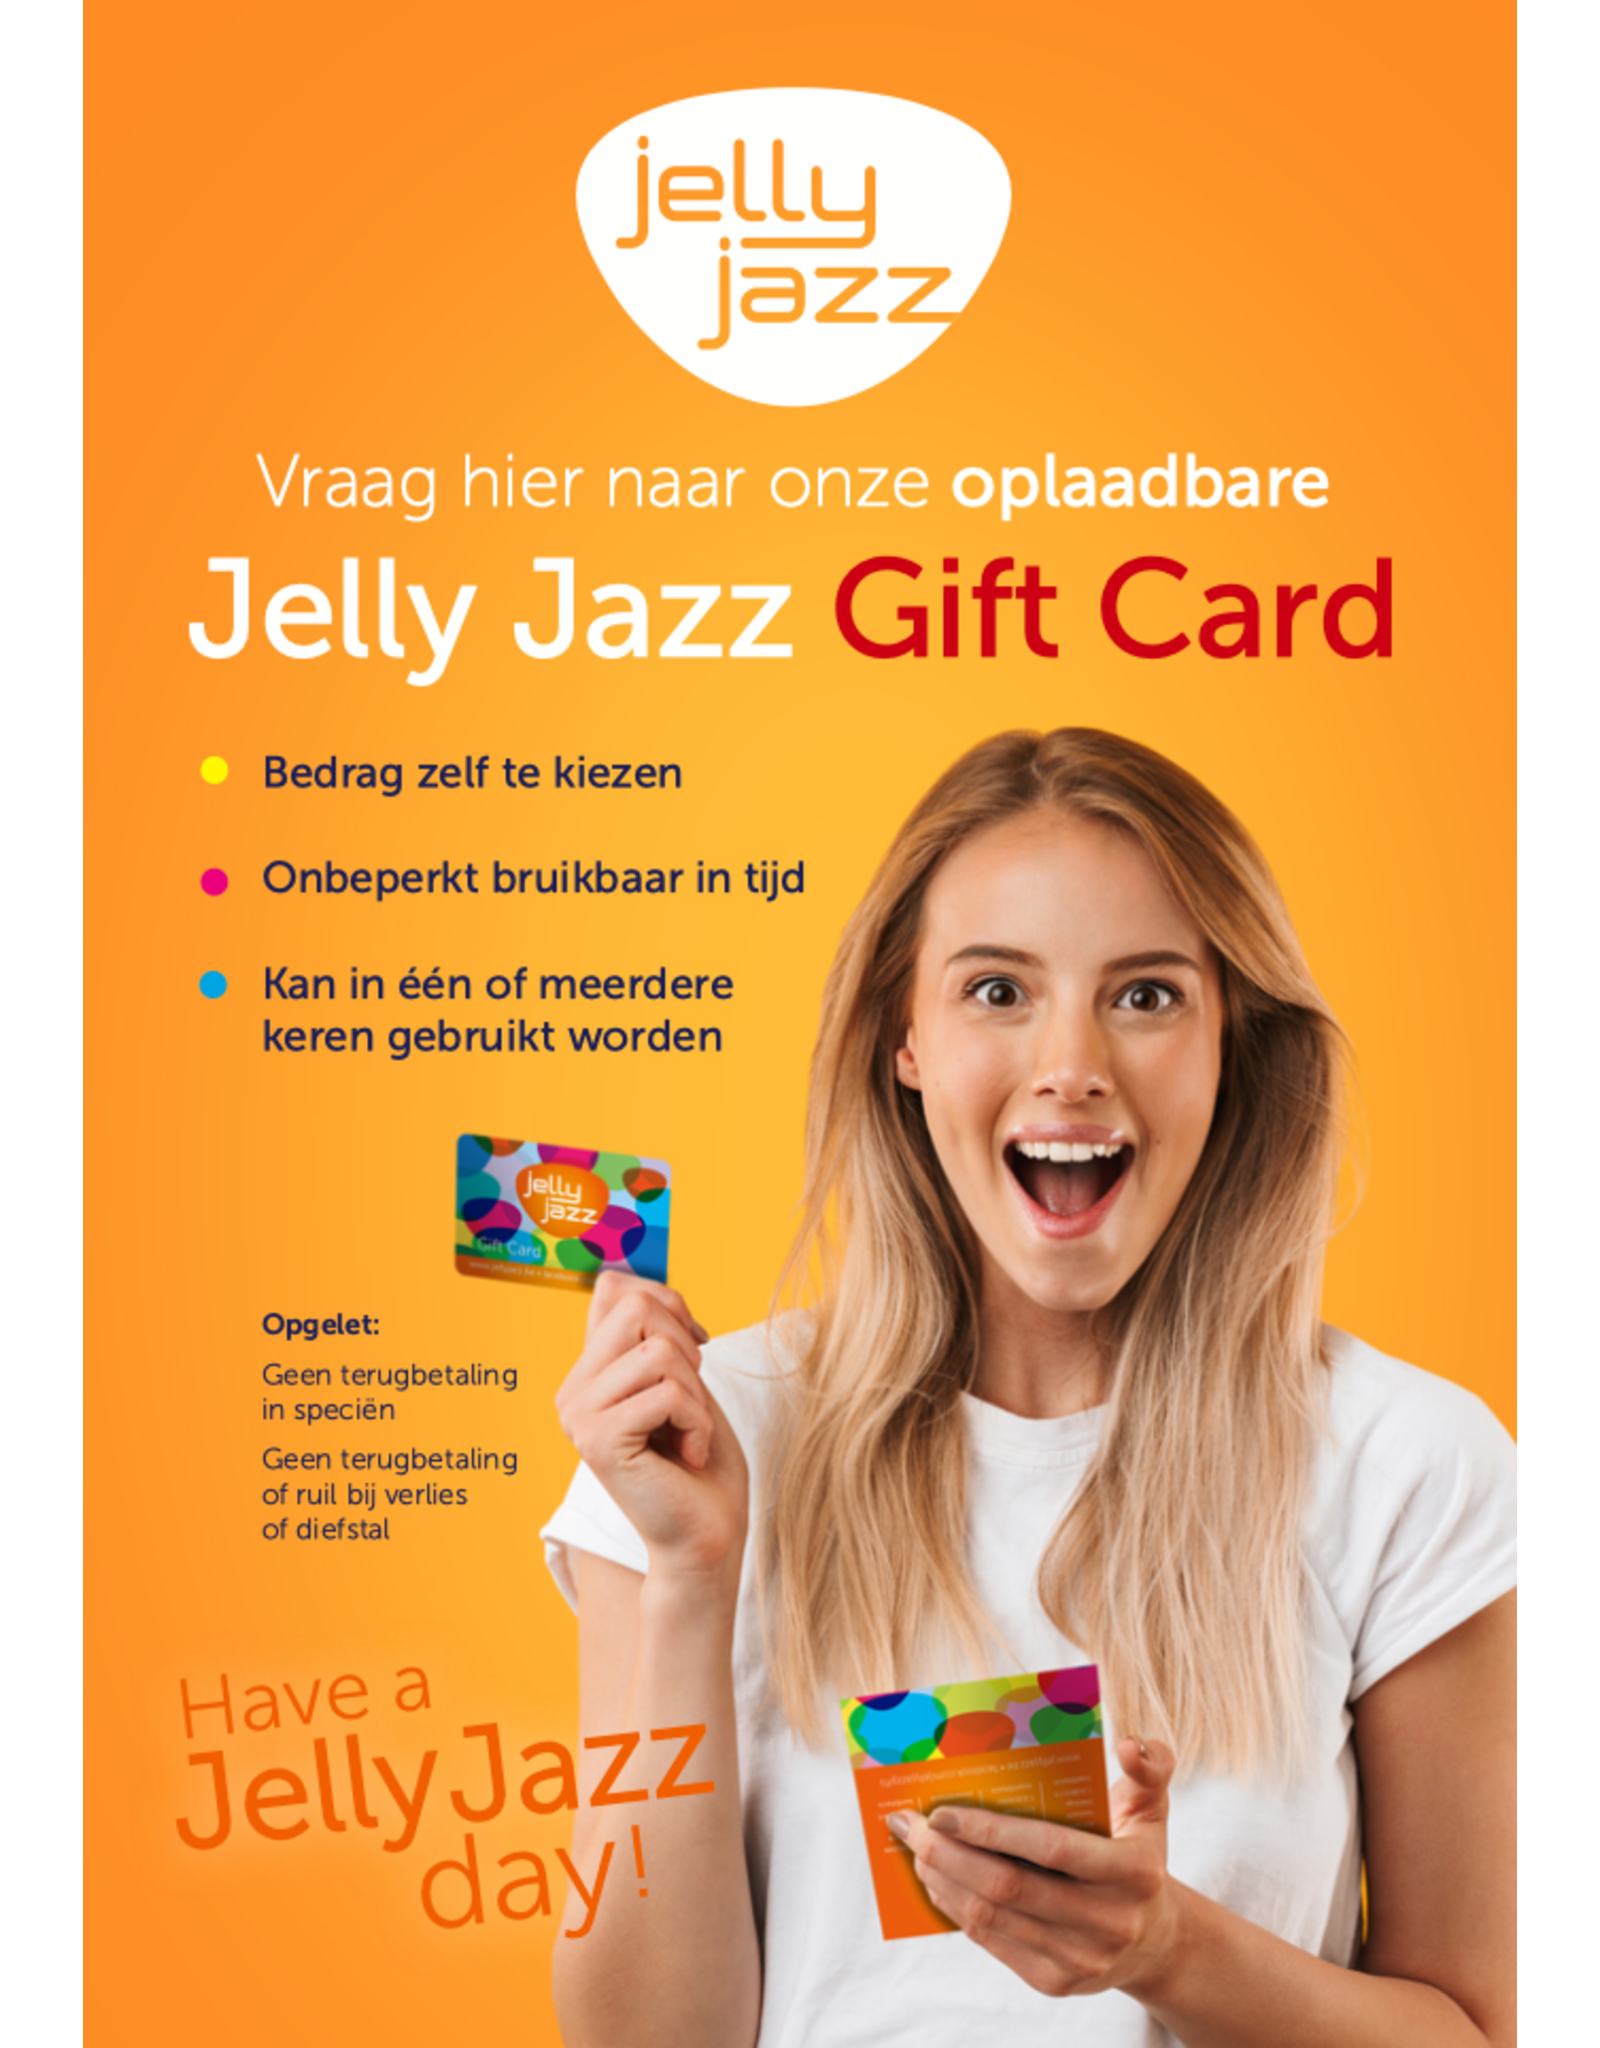 Jelly Jazz gift card €25